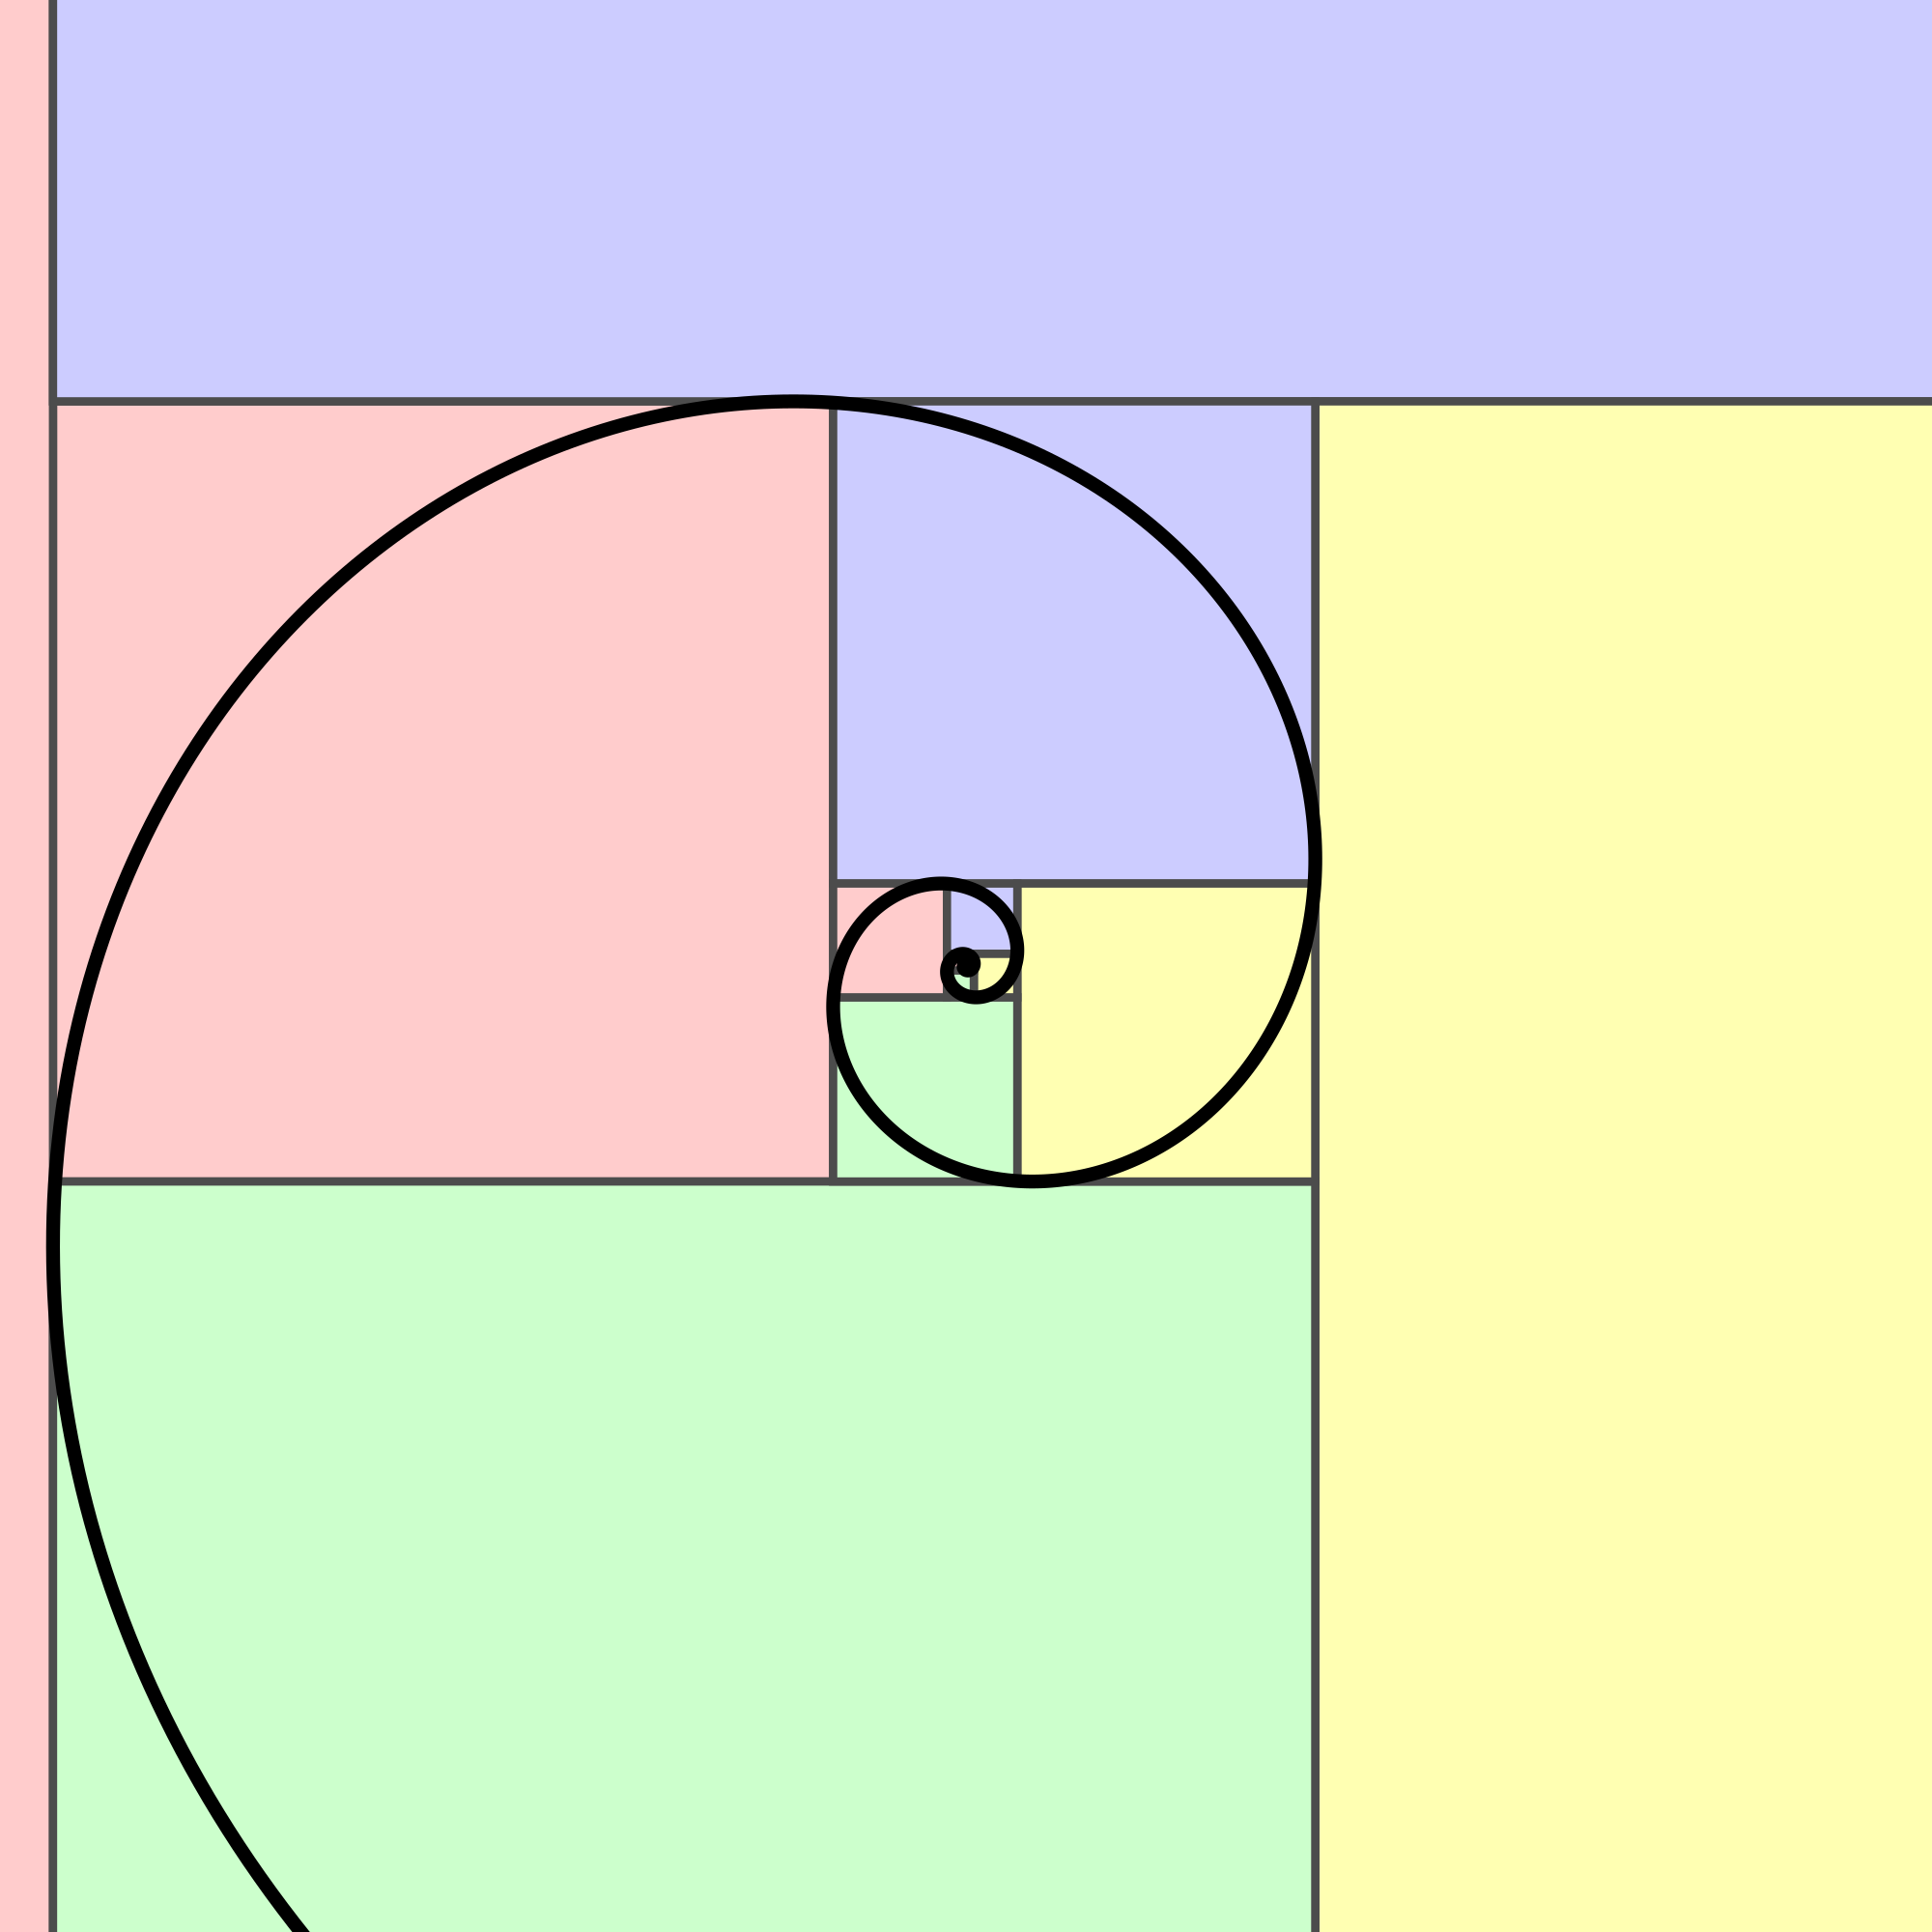 goldenspirallogarithmic_color.png